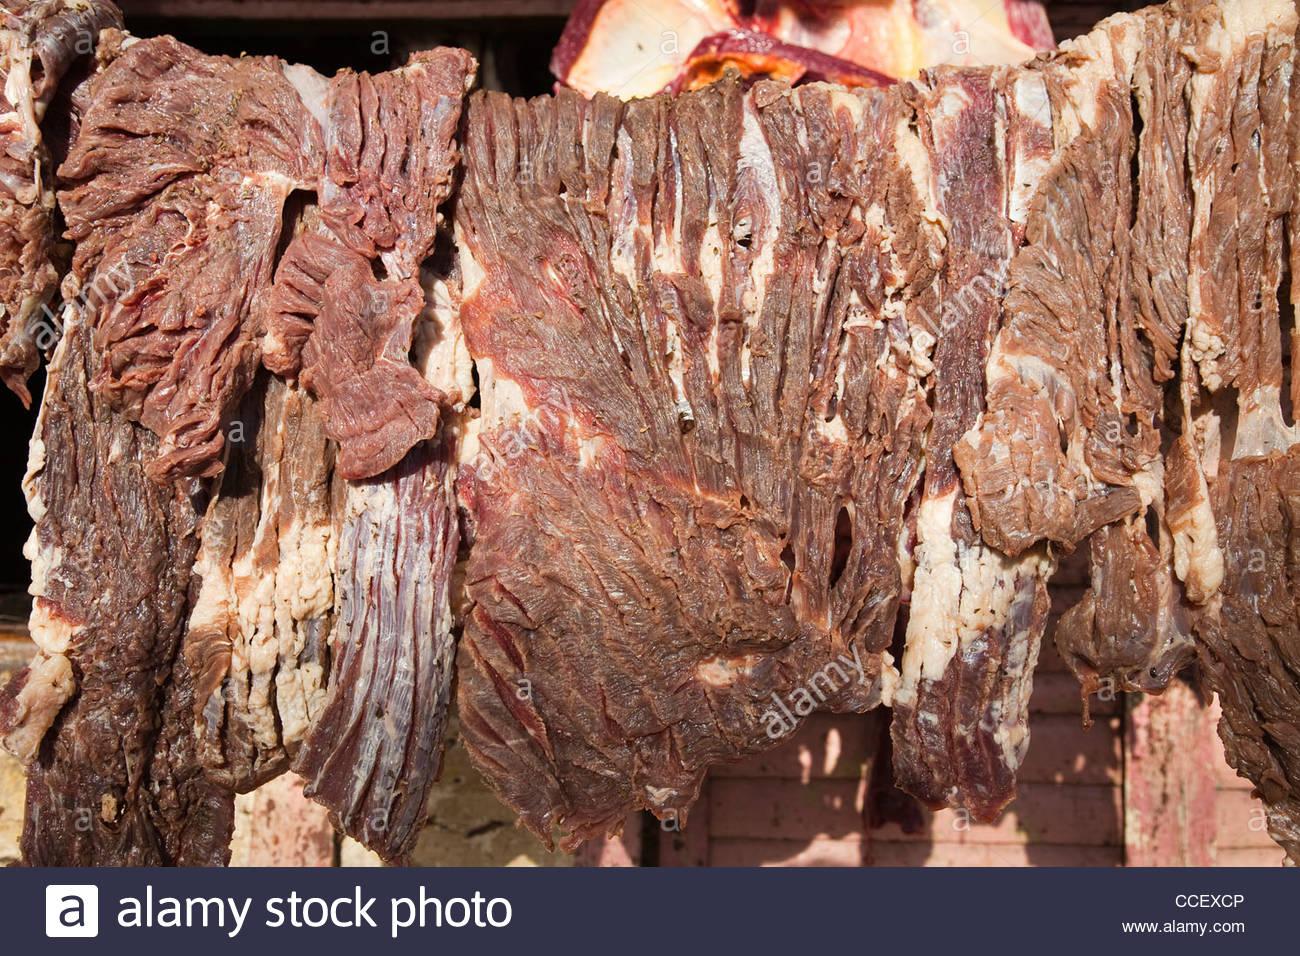 meat to dry,otra banda,hispaniola,dominican republic,caribbean - Stock Image